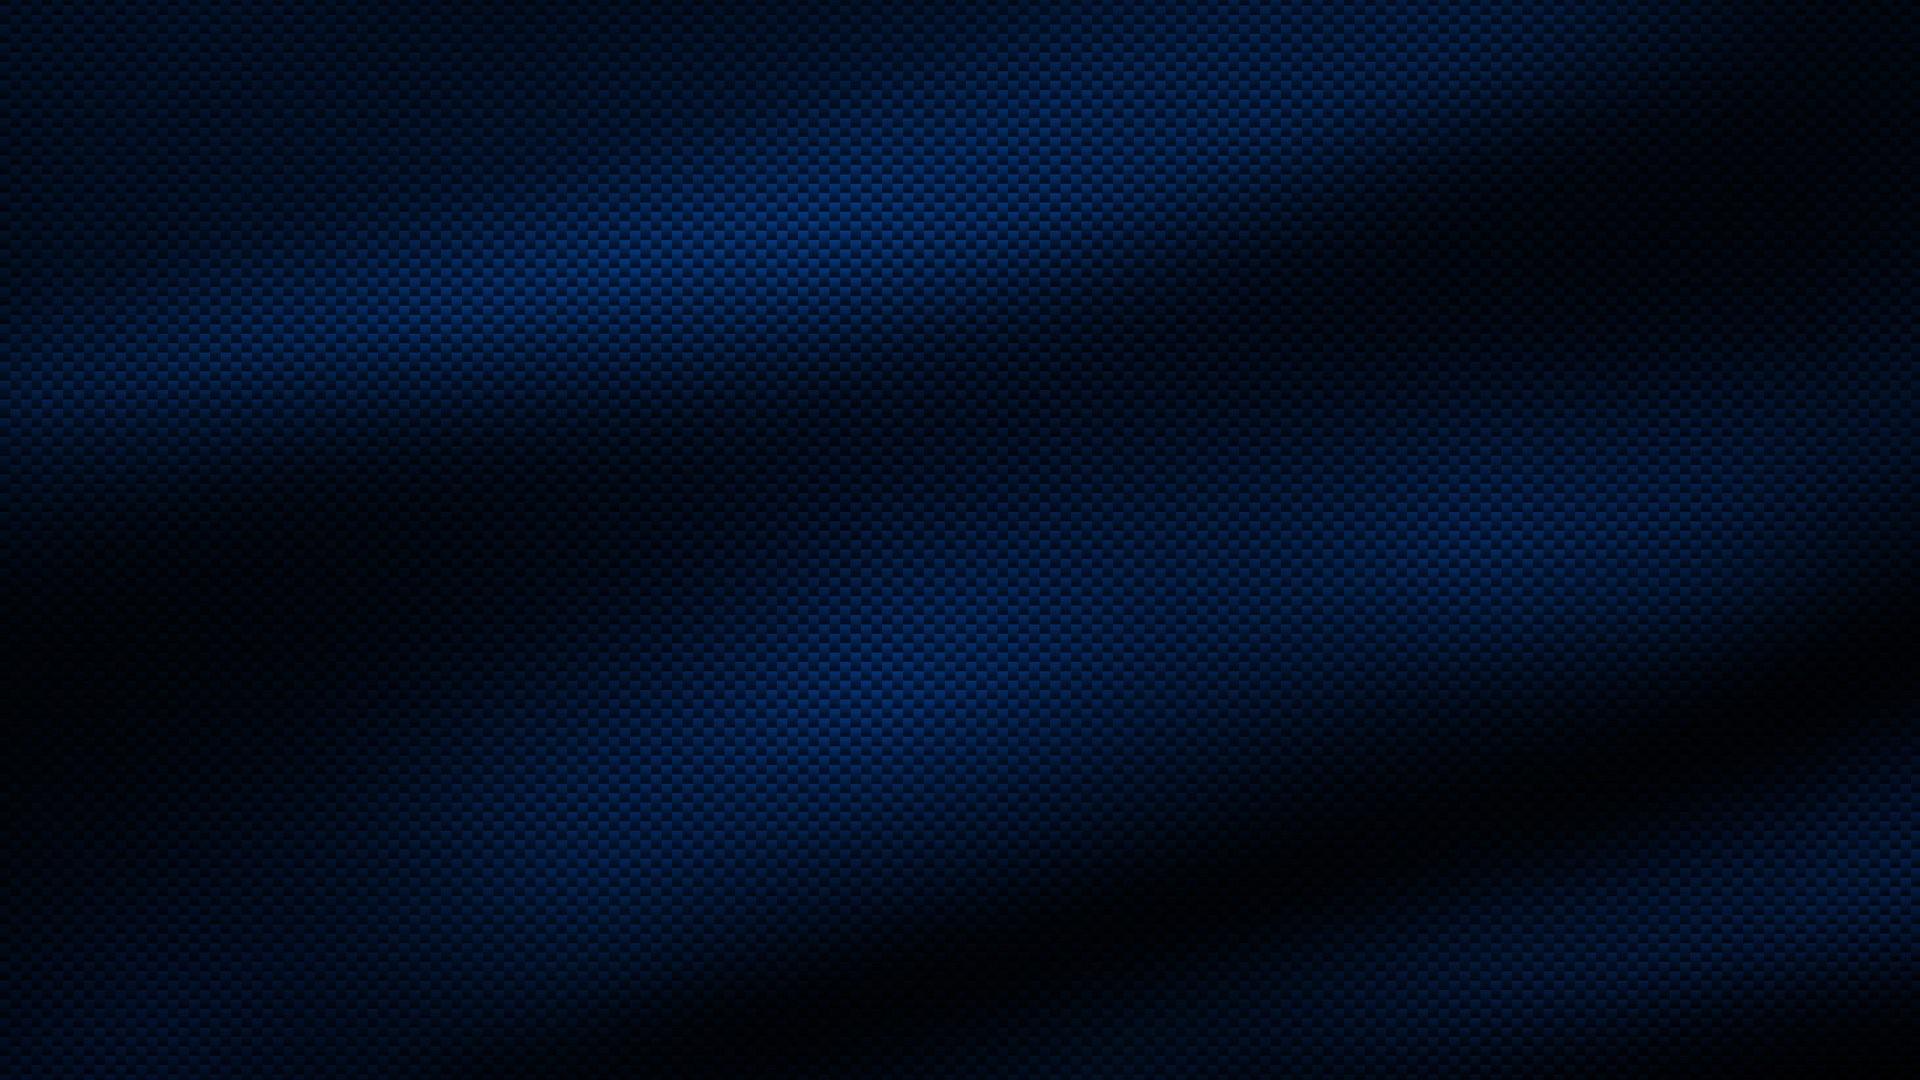 Carbon Fiber Fabric Abstract HD Wallpaper